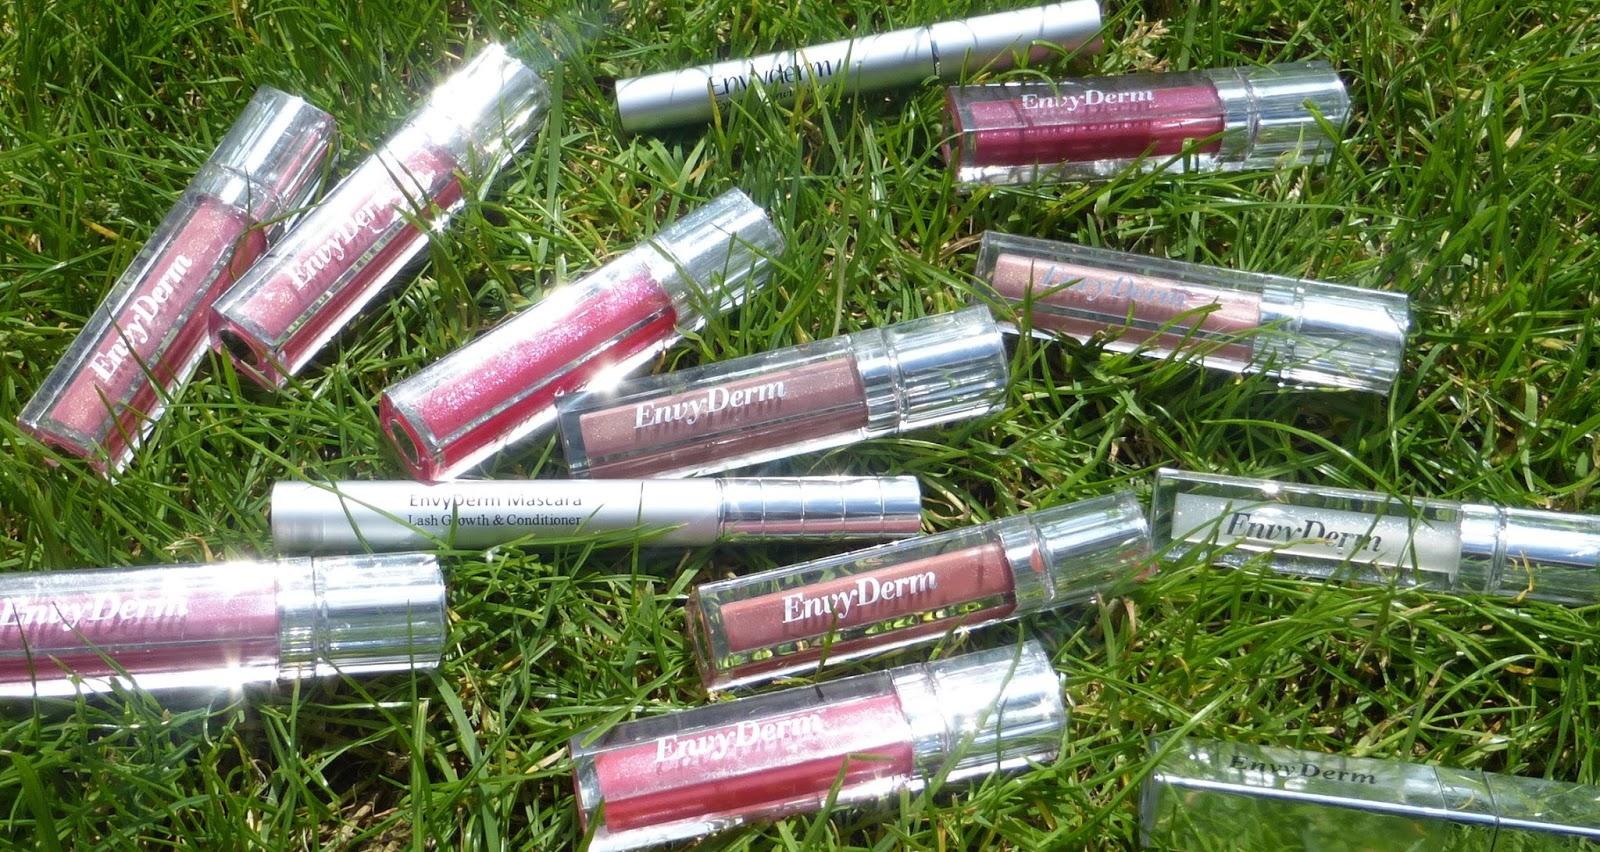 Envyderm Cosmetics, lip plumper, brand ambassador